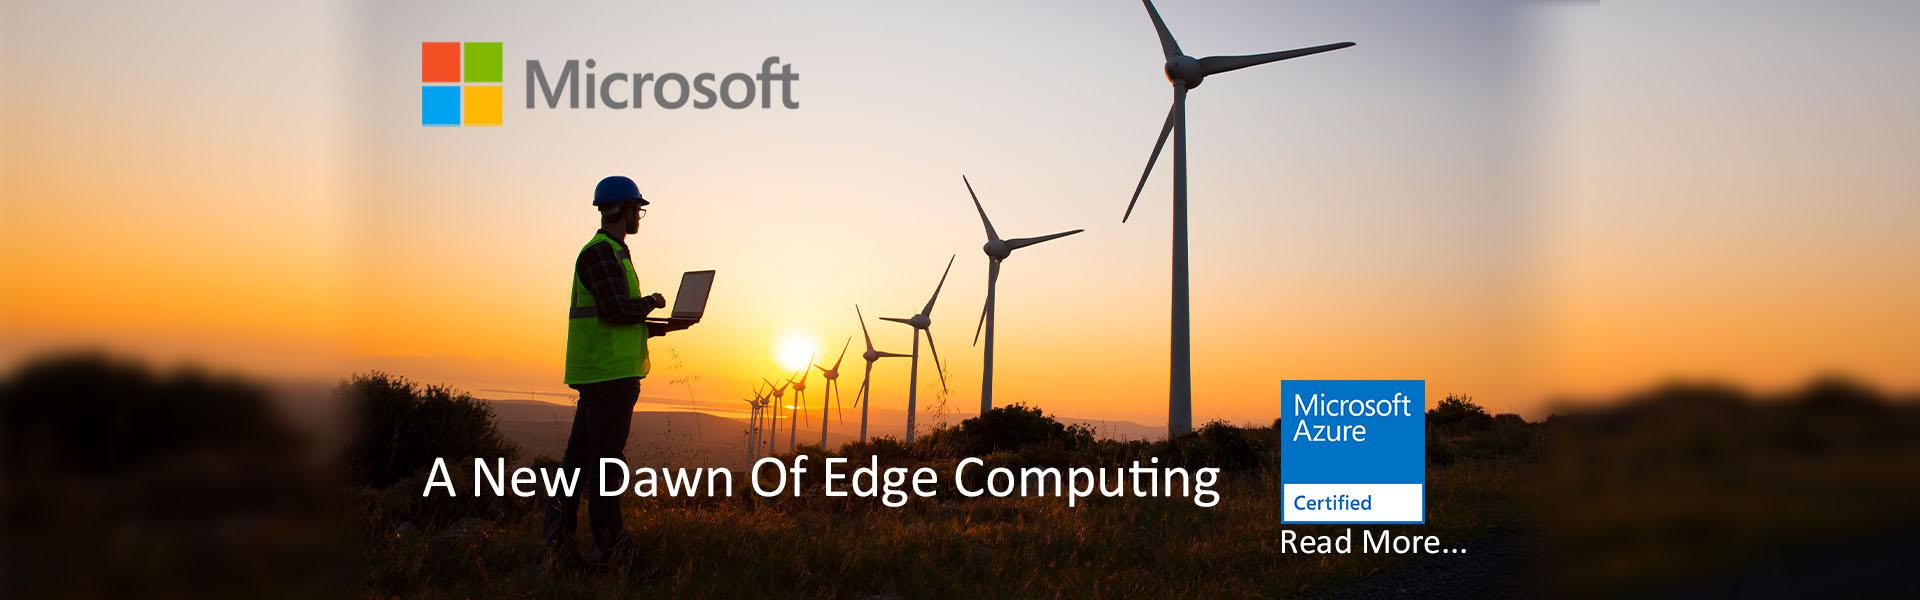 Microsoft Azure IoT Certified